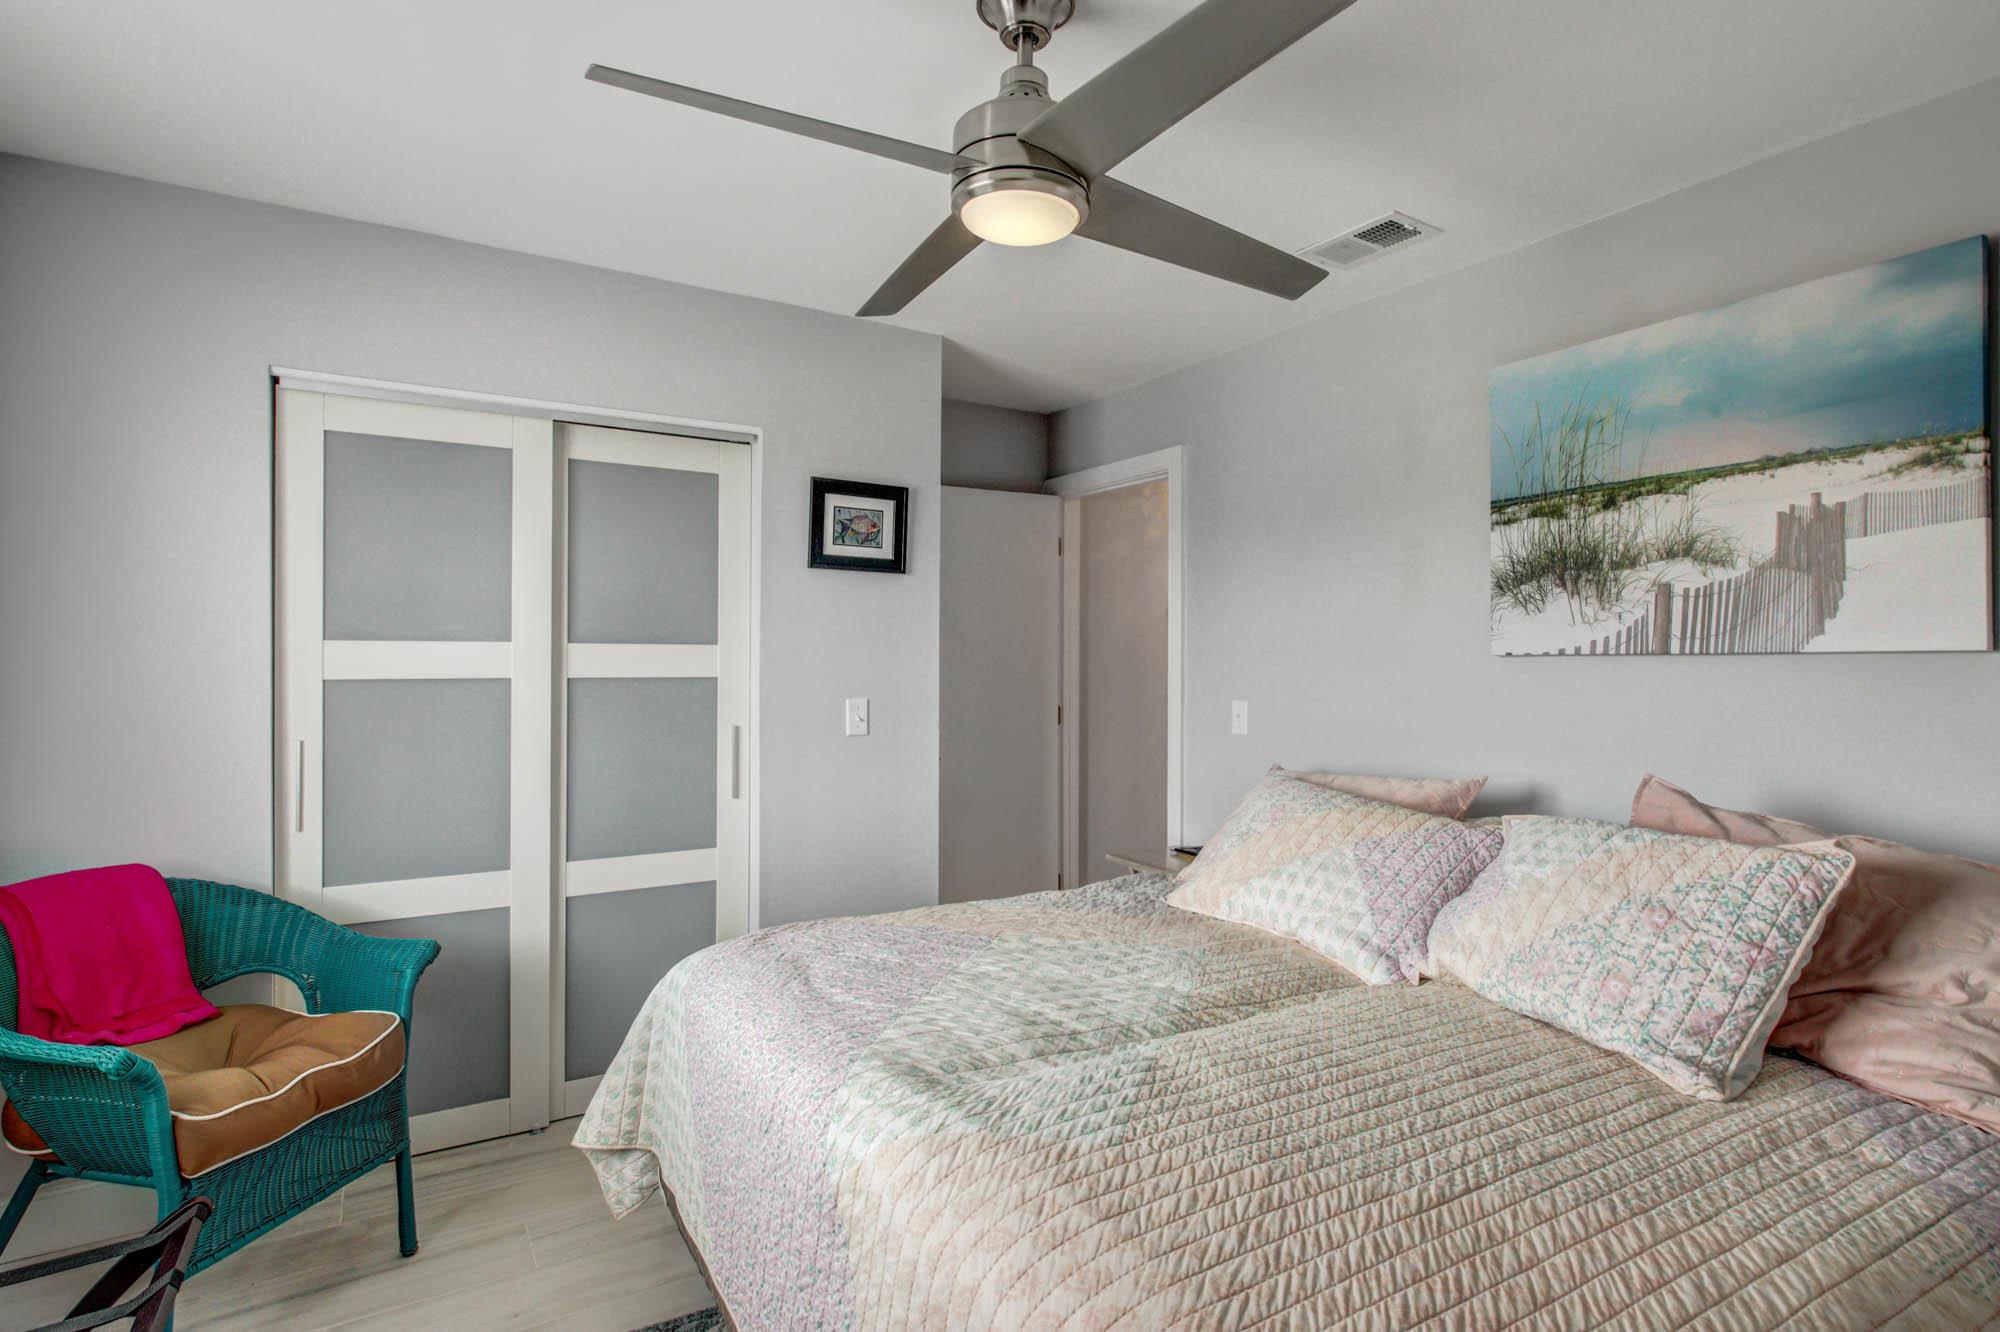 75 Mariners Cay Drive UNIT #75 Folly Beach, SC 29439